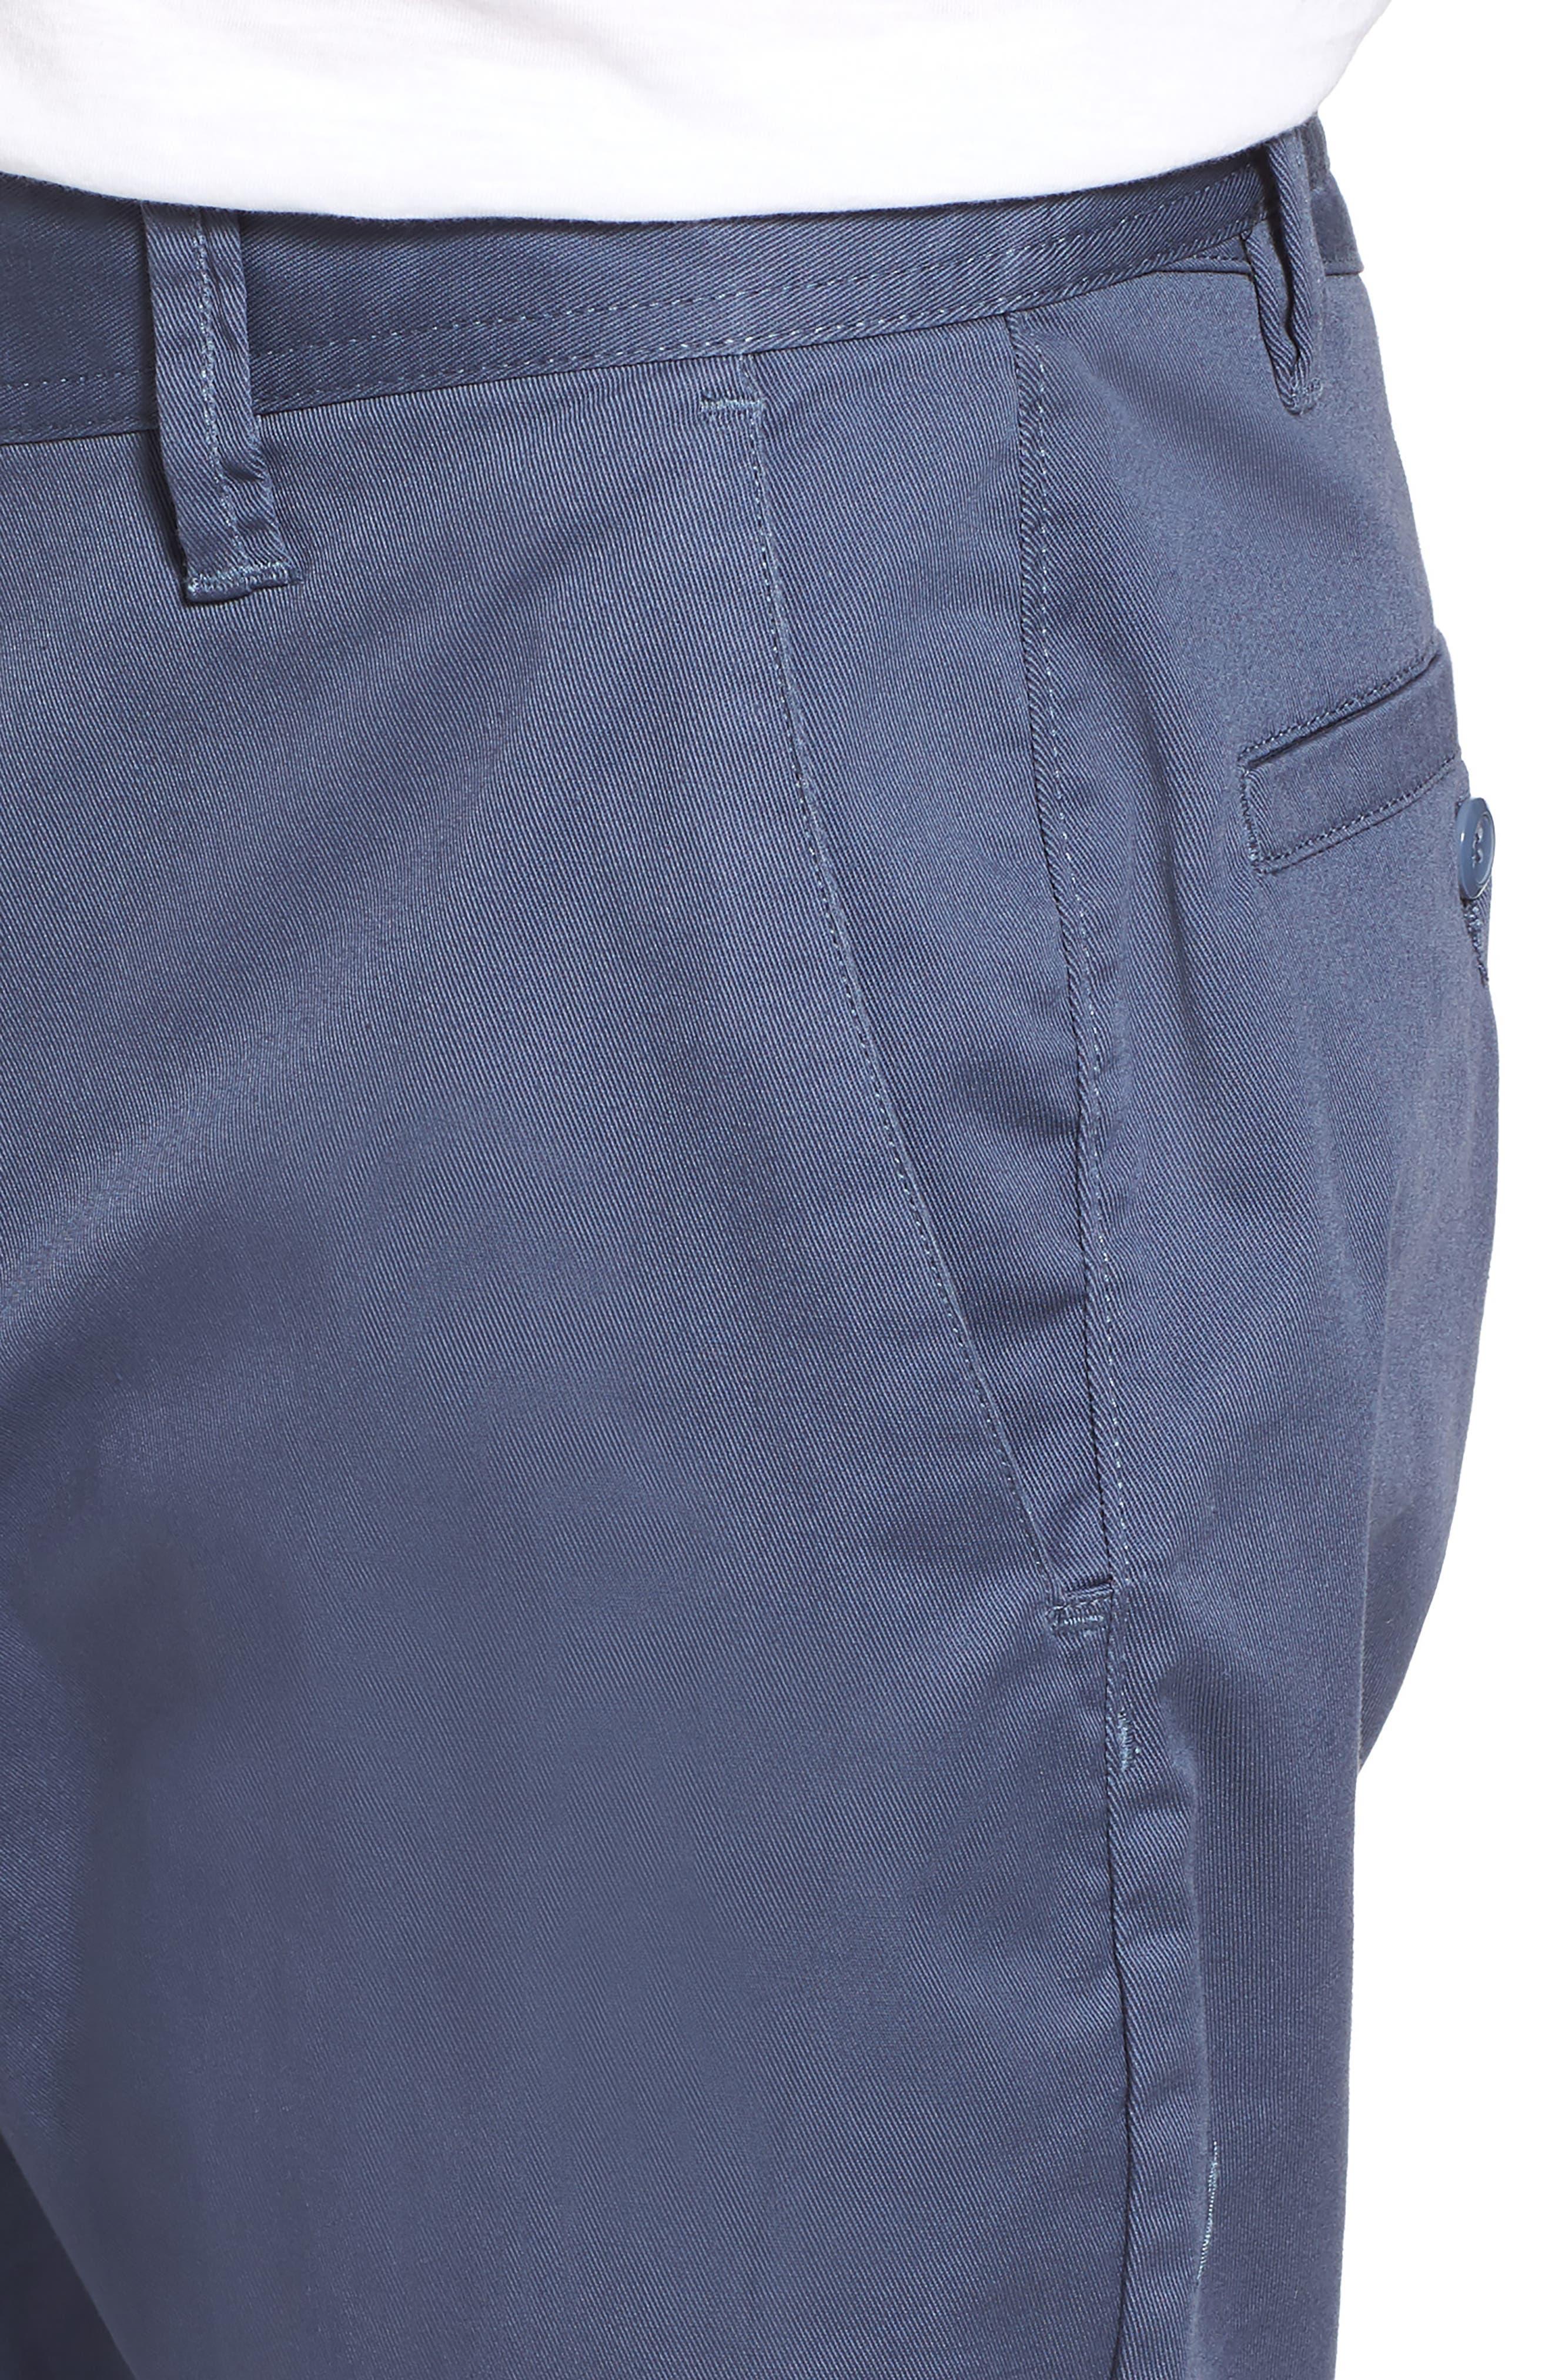 'Modern' Stretch Chino Shorts,                             Alternate thumbnail 34, color,